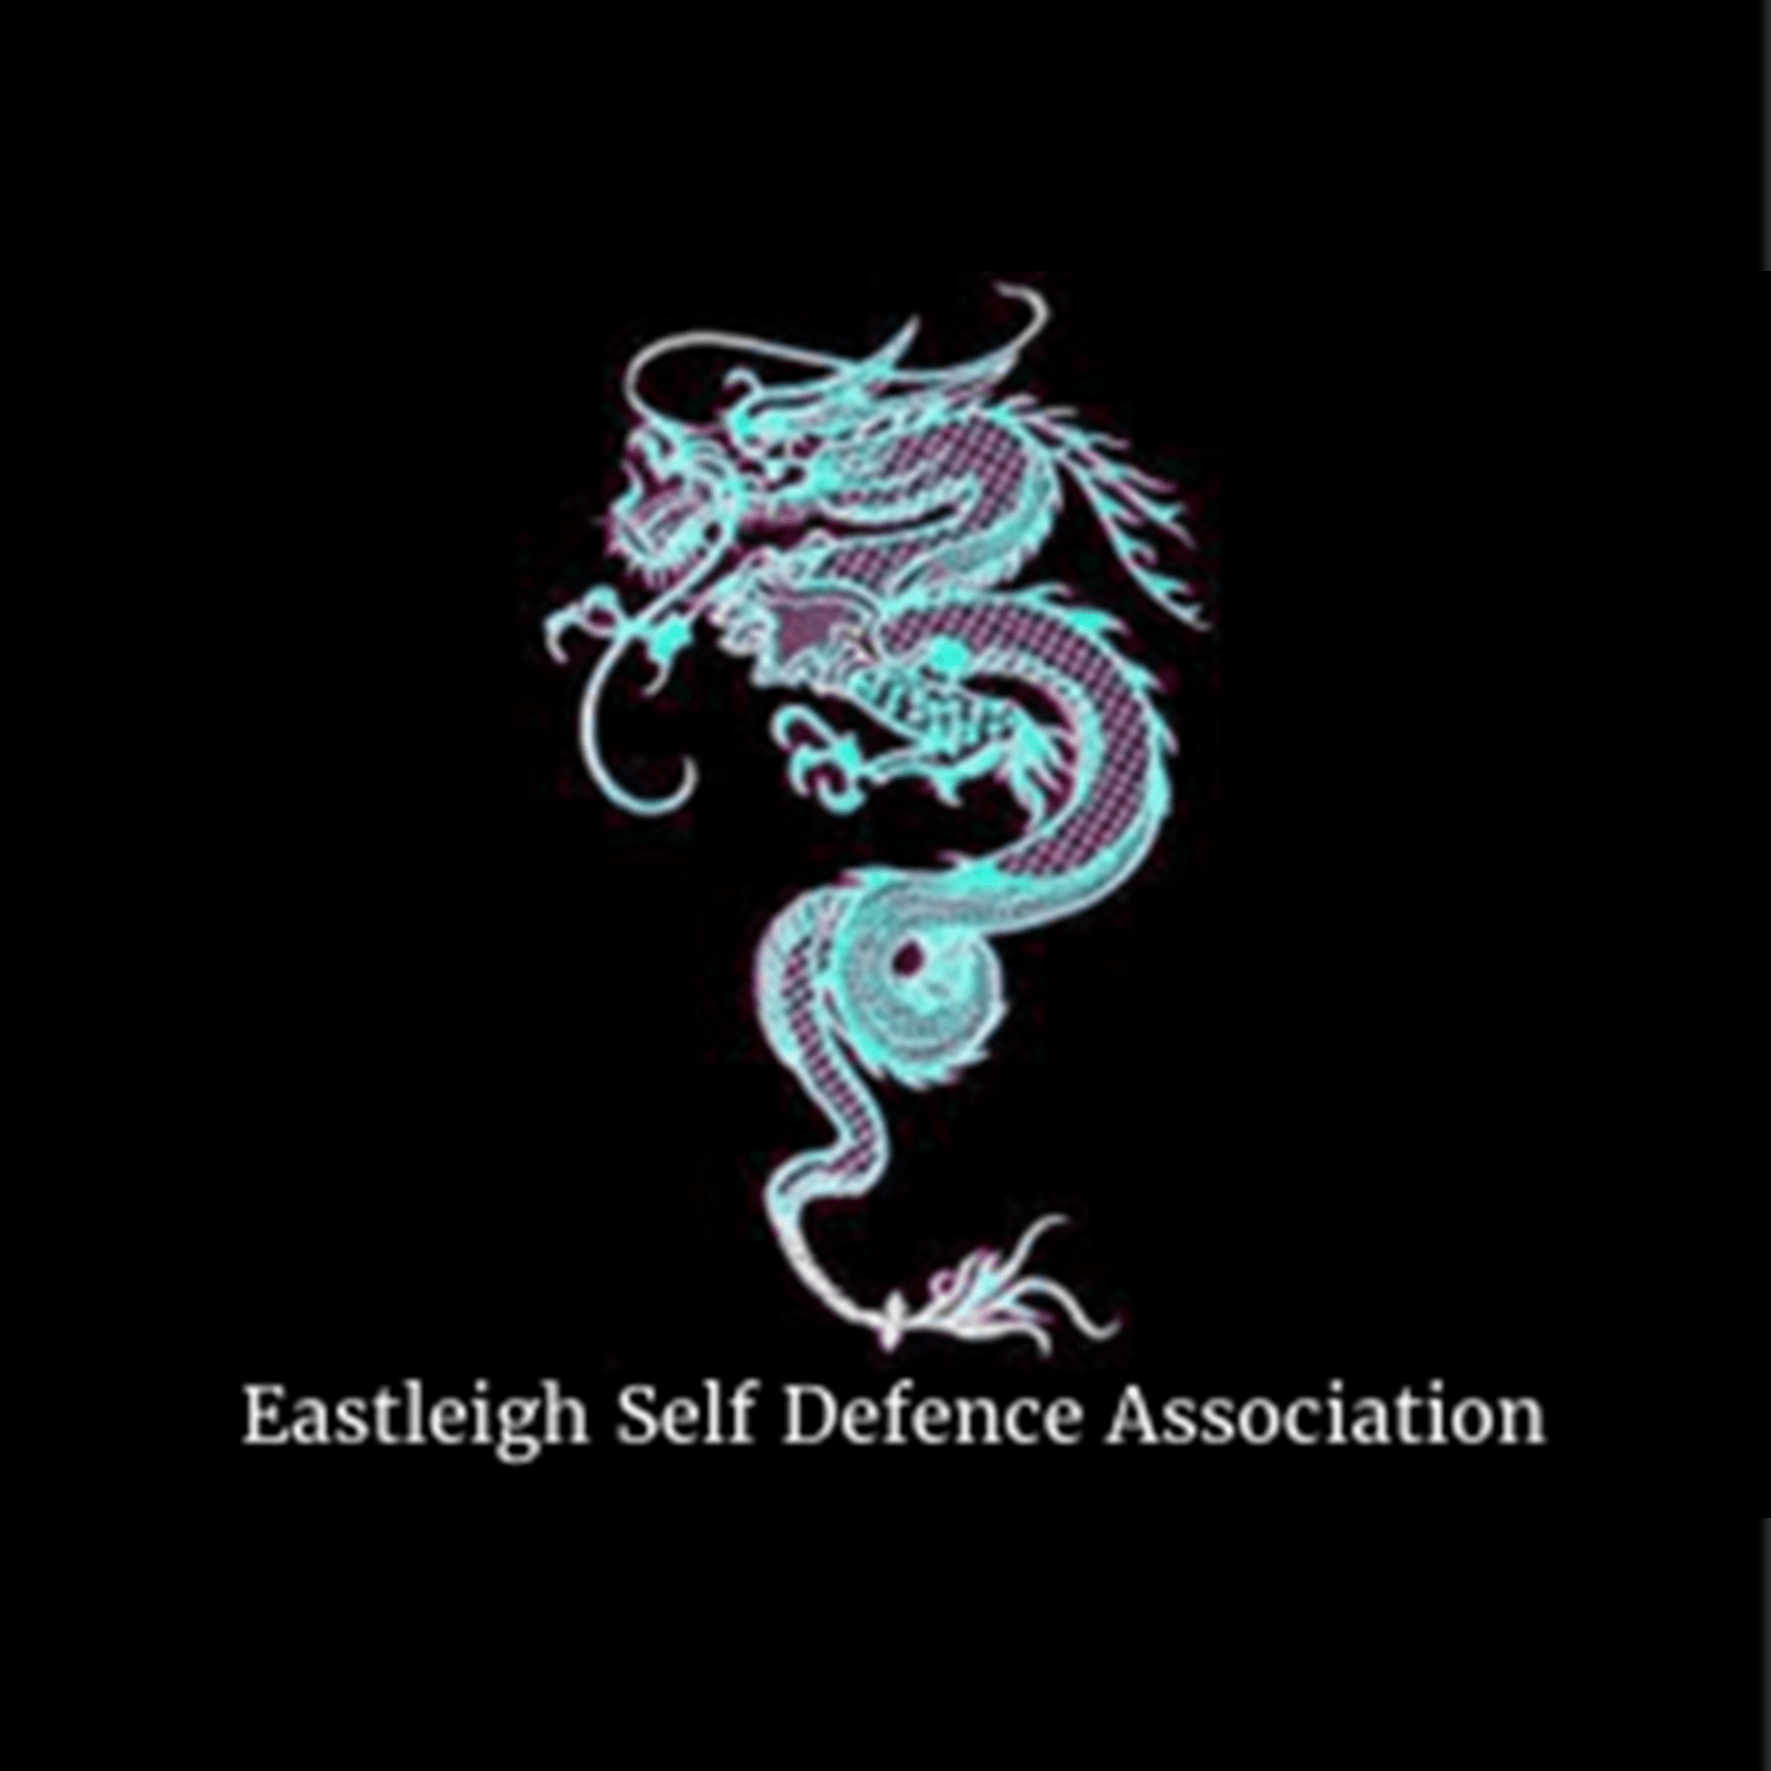 Eastleigh Self Defence Association